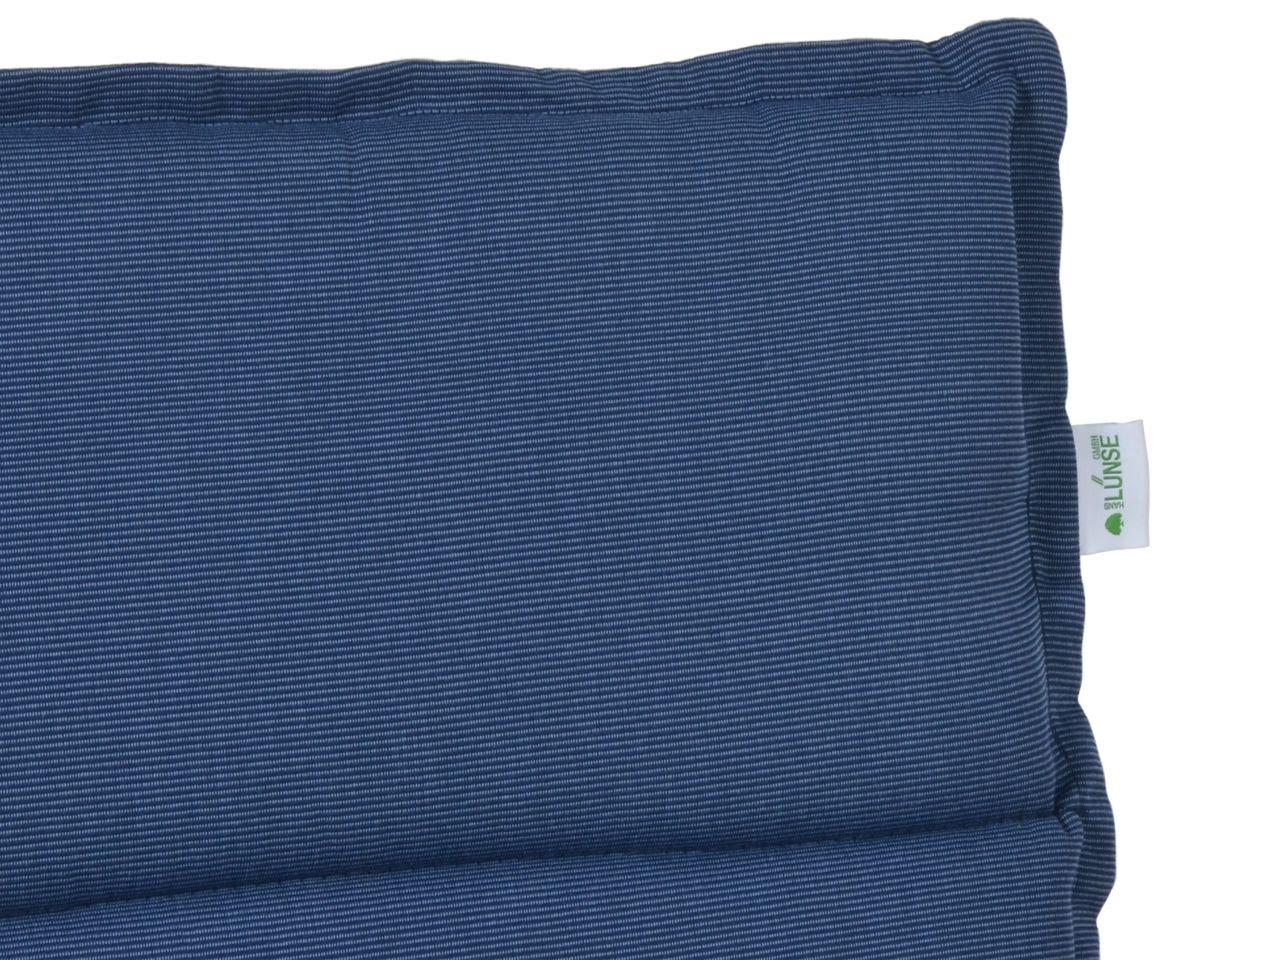 Auflage Malibu, Strukturpolyester, Farbe denim-blue